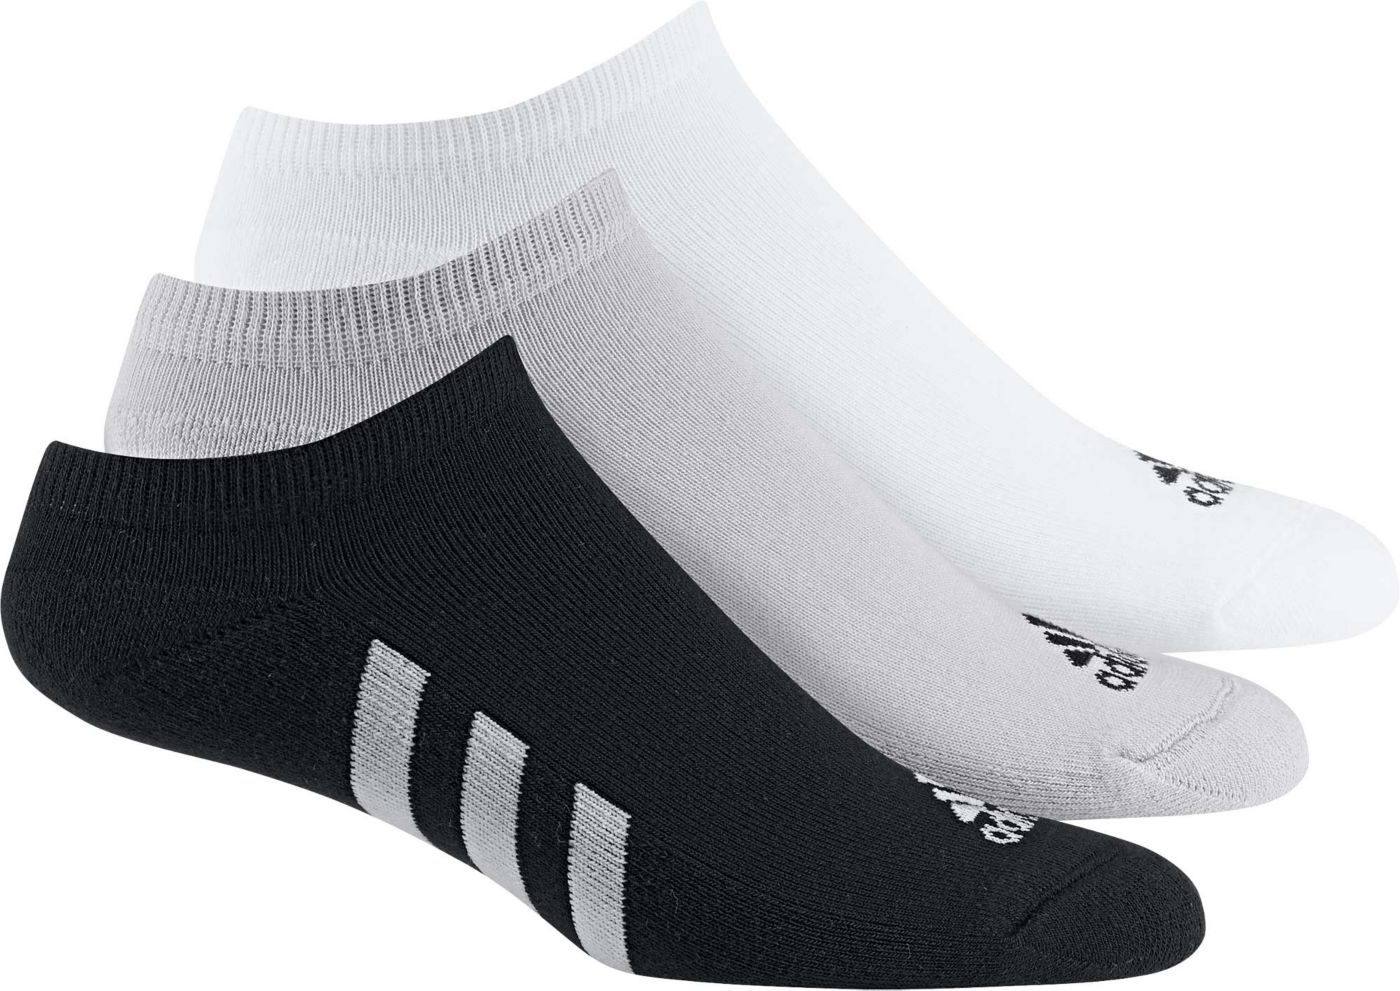 adidas Men's No Show Golf Socks – 3 pack